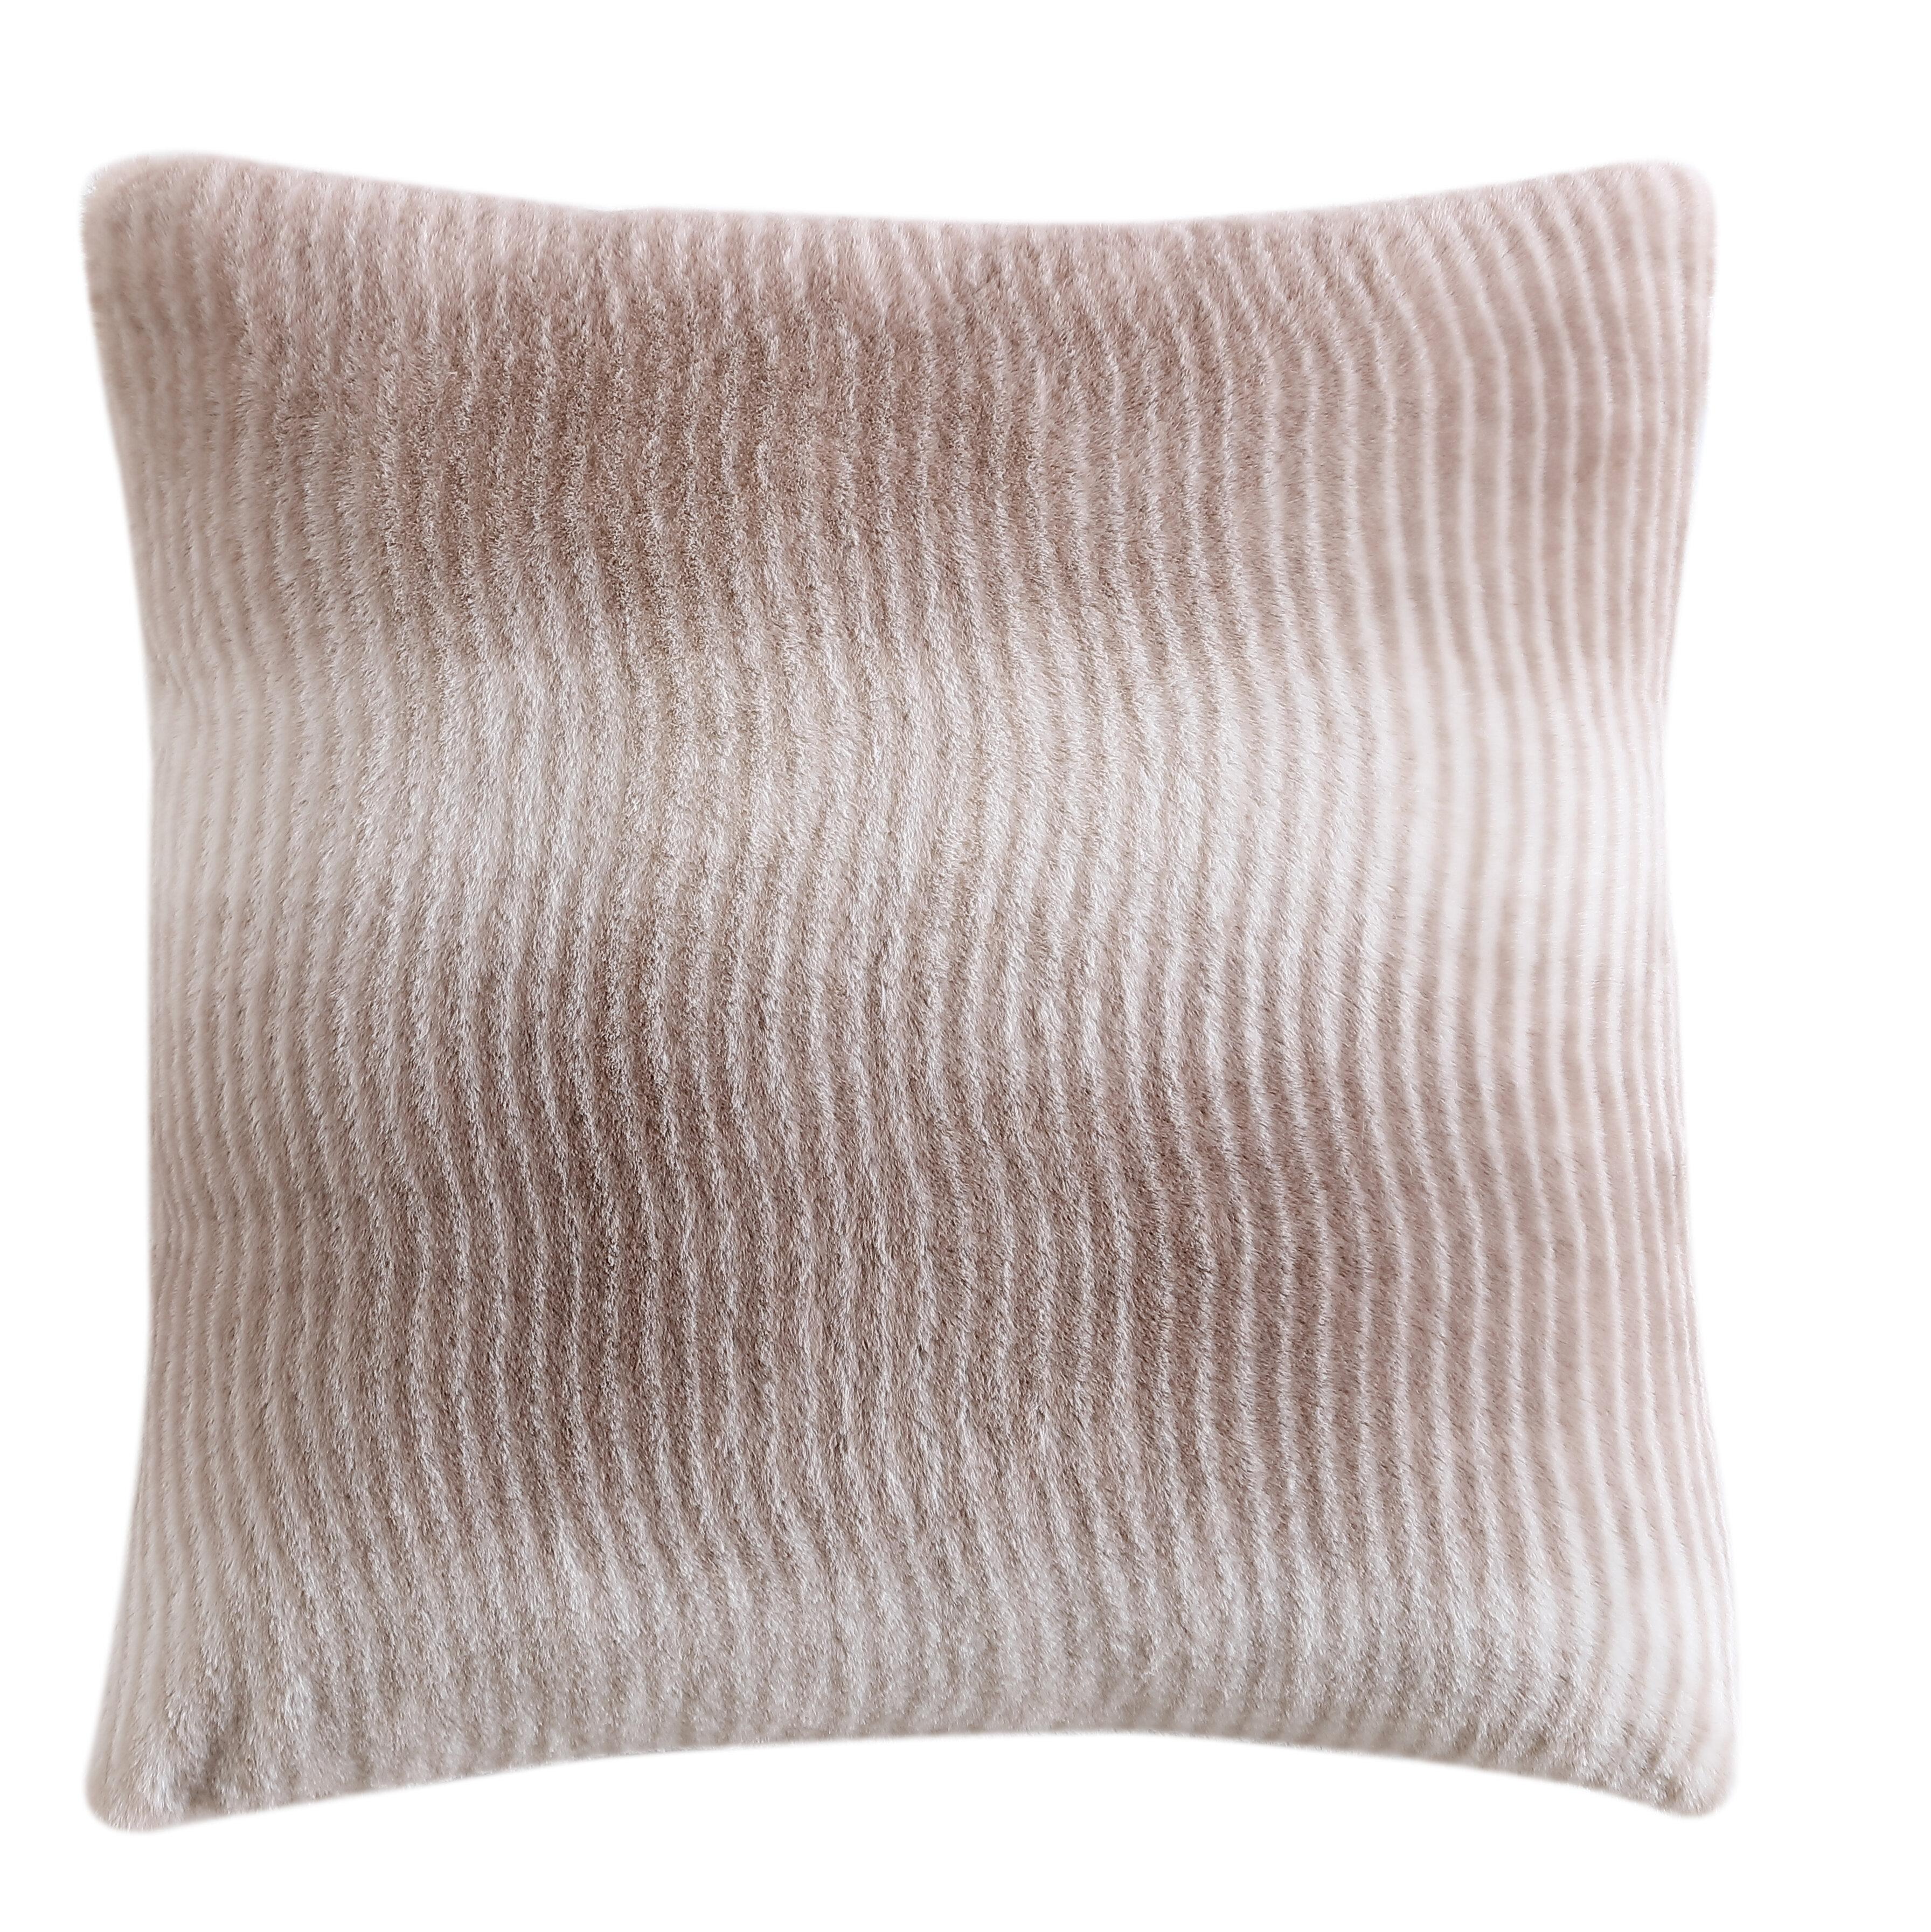 Ebern Designs Saine Striped 18 Throw Pillow Cover Wayfair